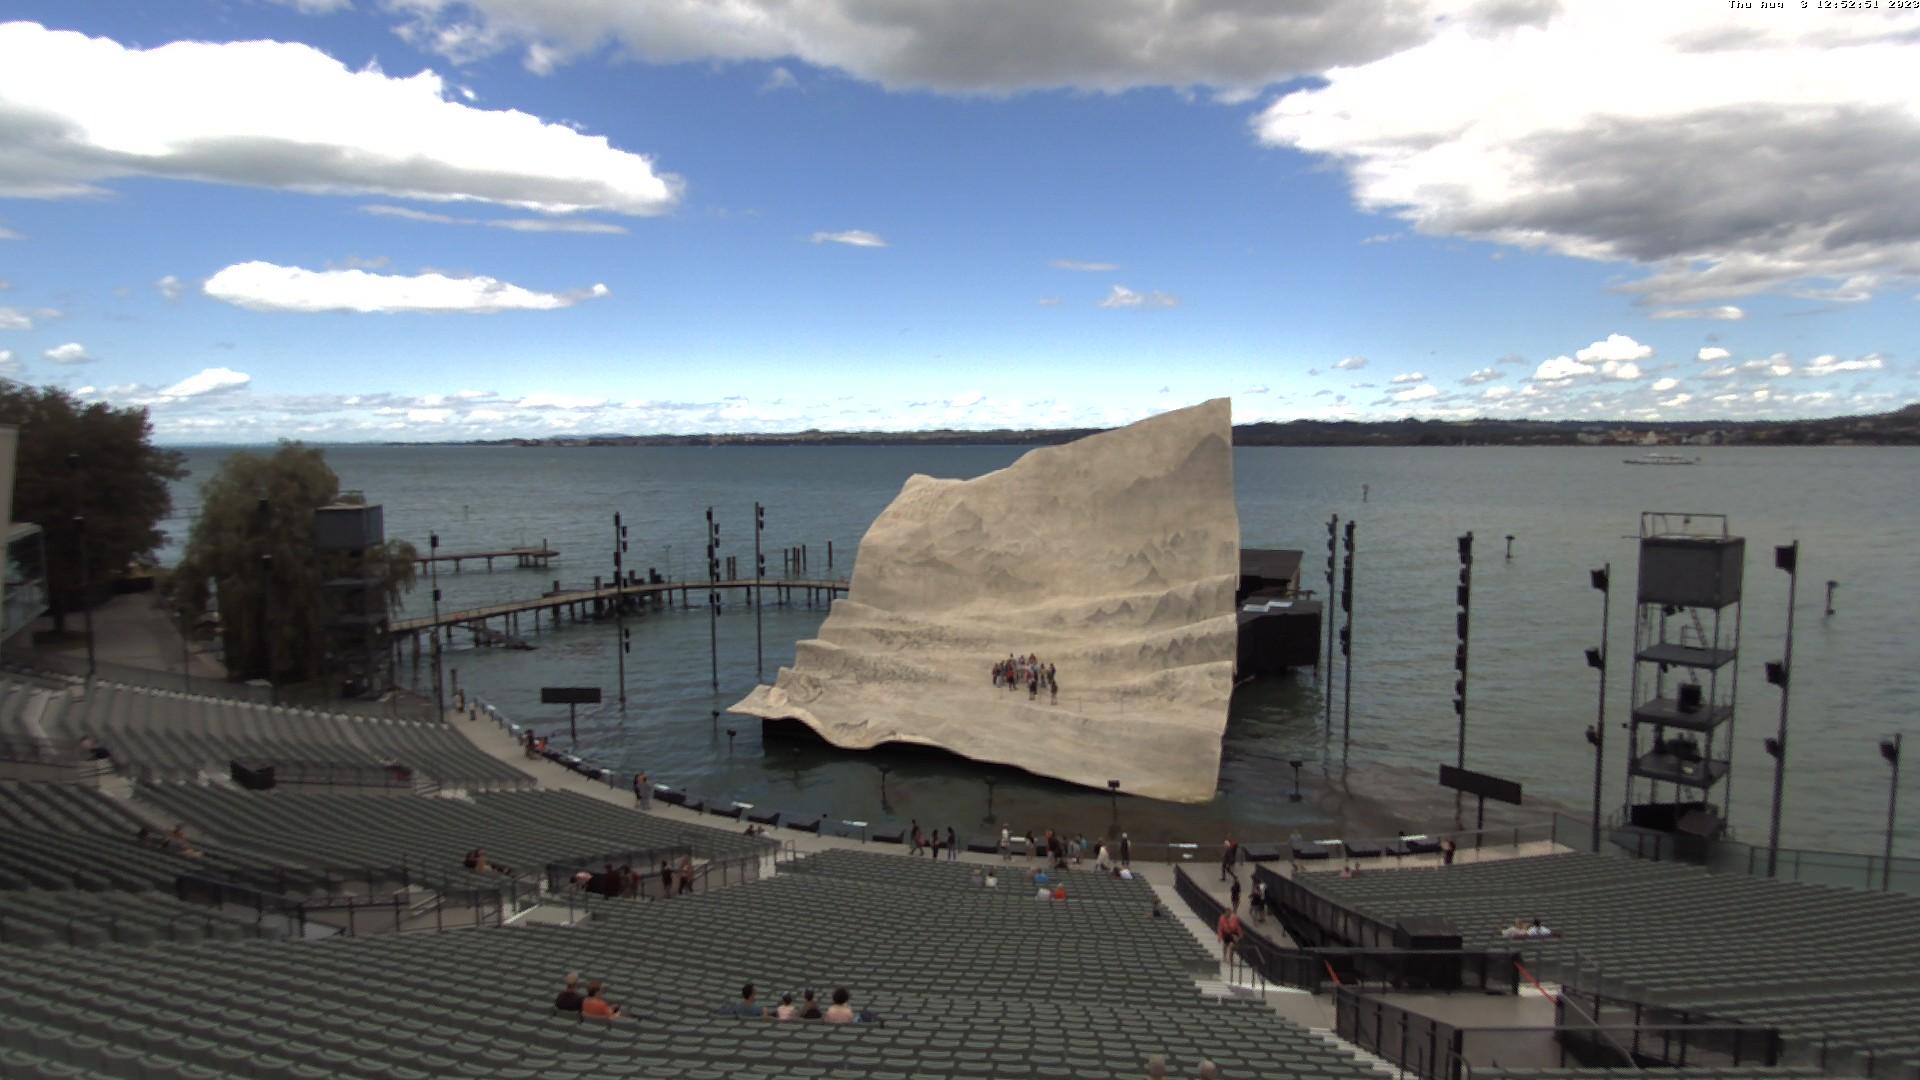 Bregenzer Festspiele (View from lake stage)